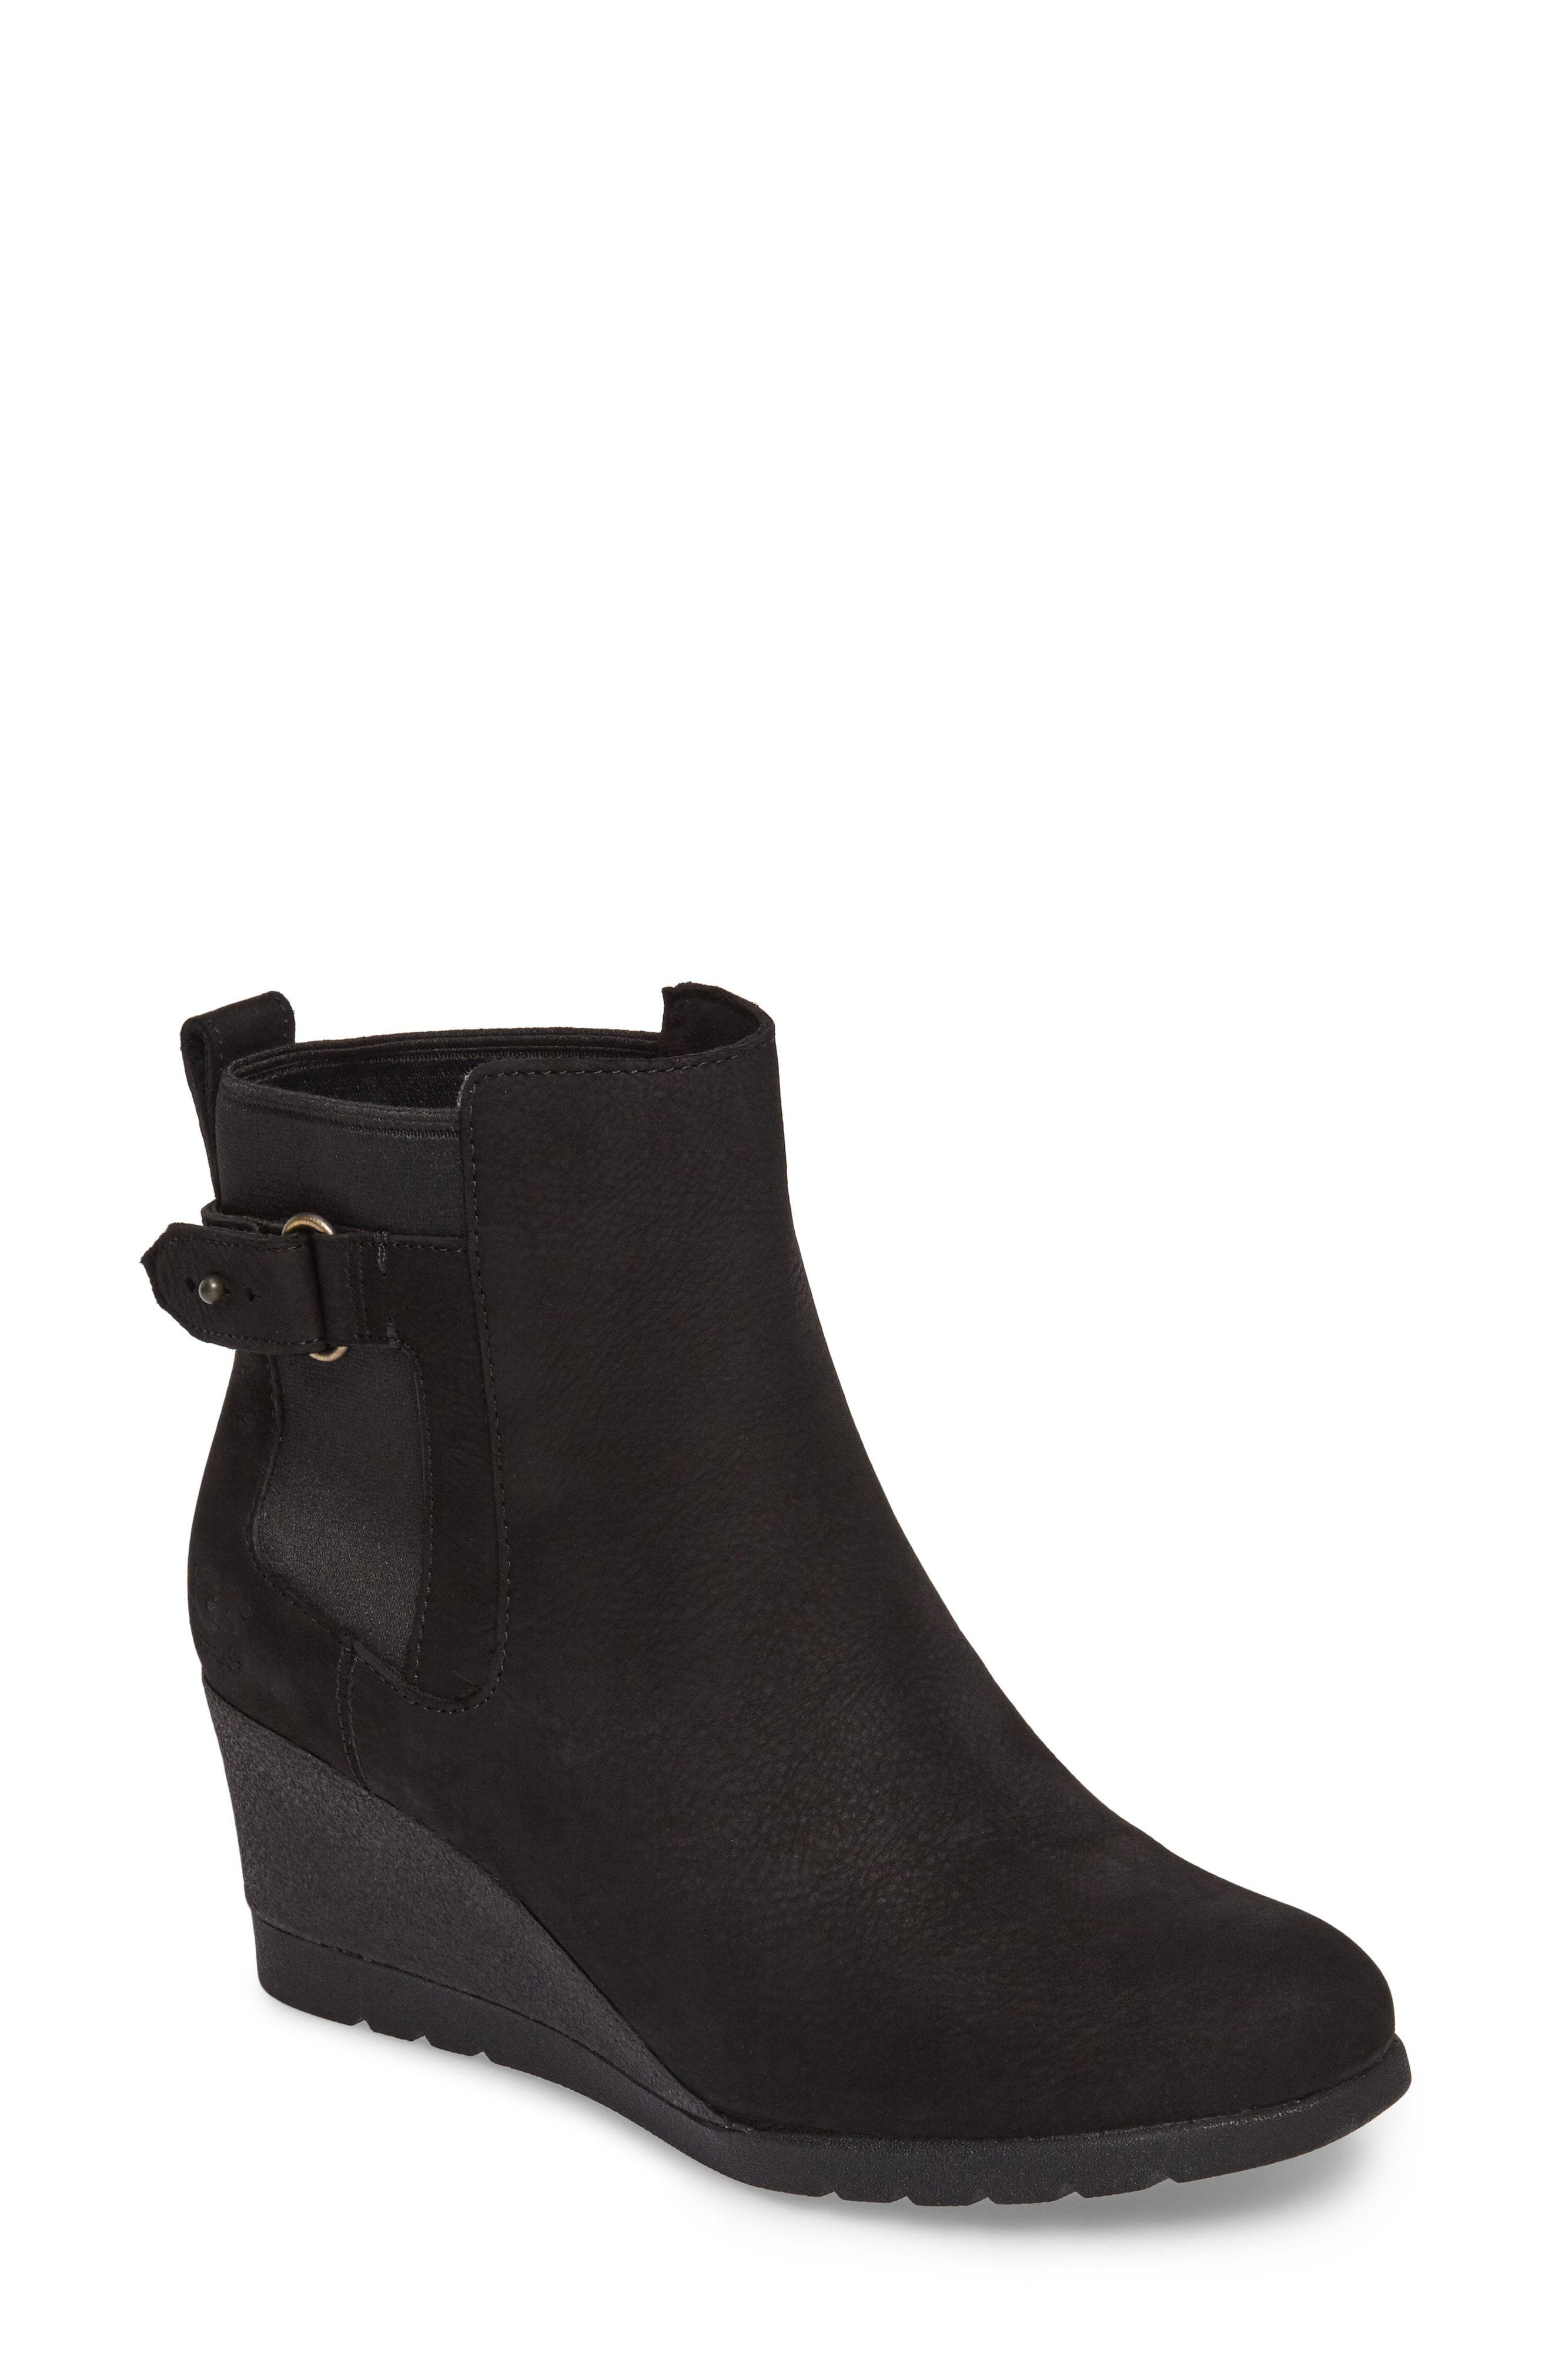 UGG® Waterproof Insulated Wedge Boot